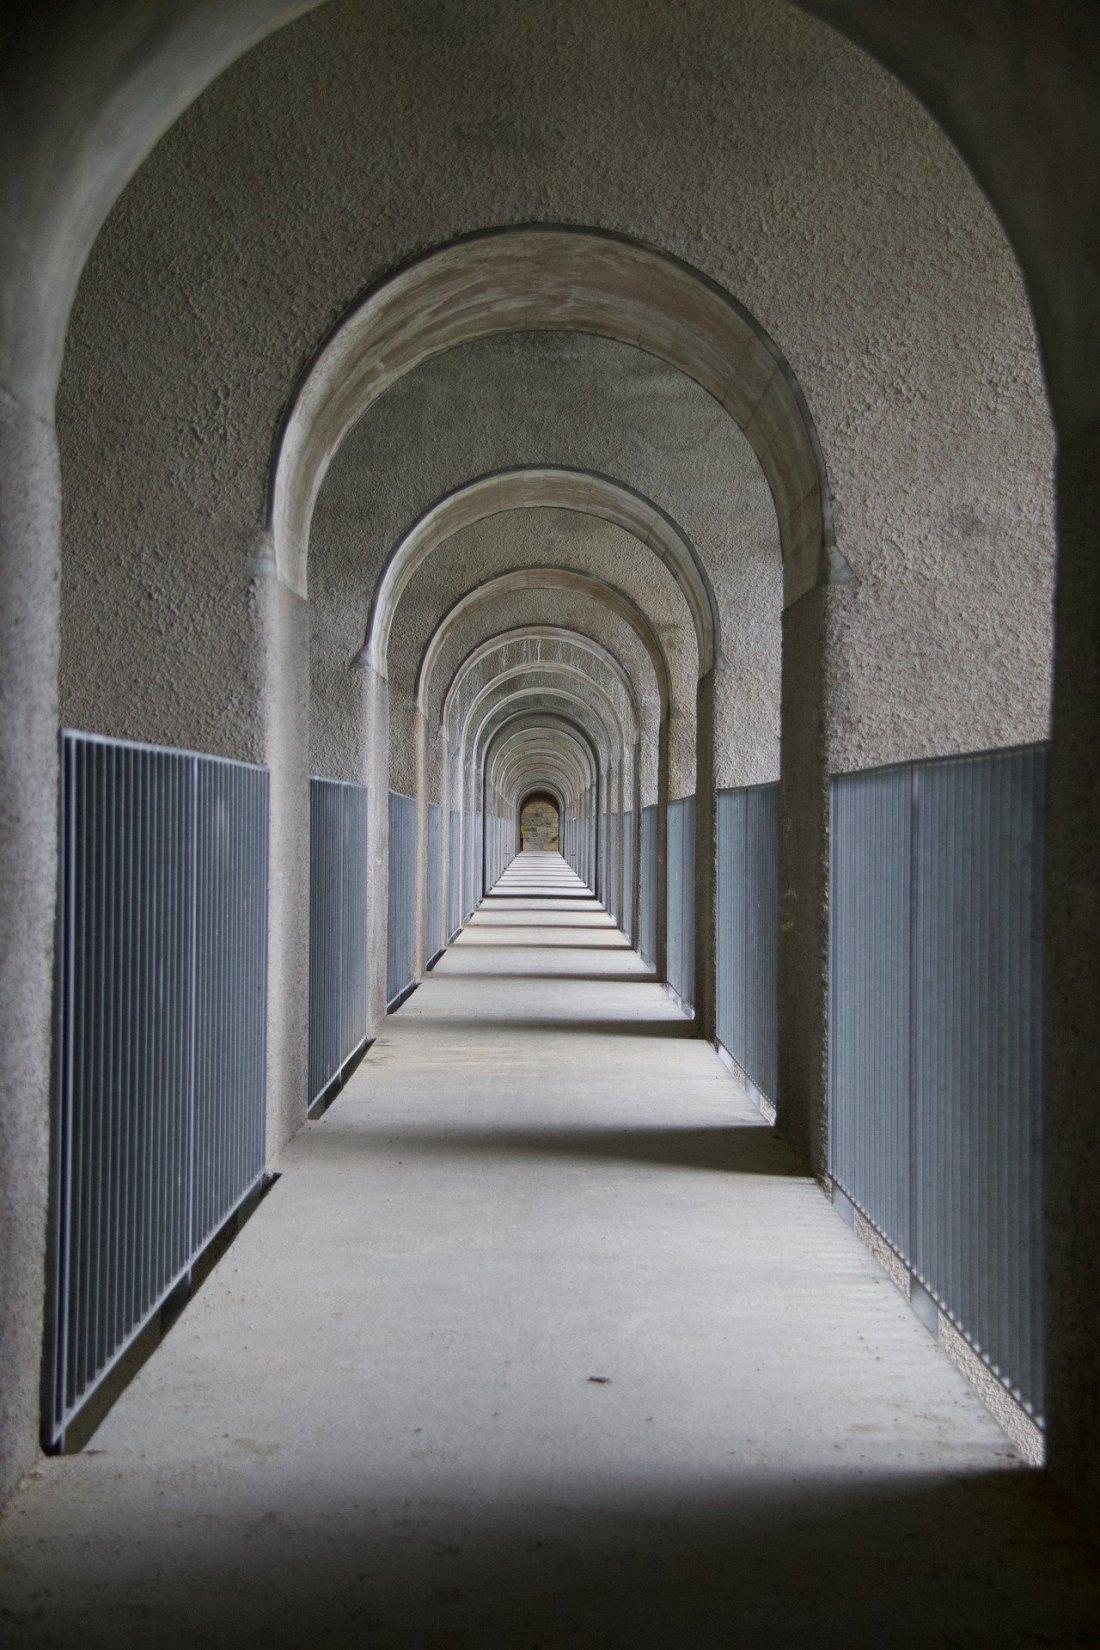 archway-5426581_1920